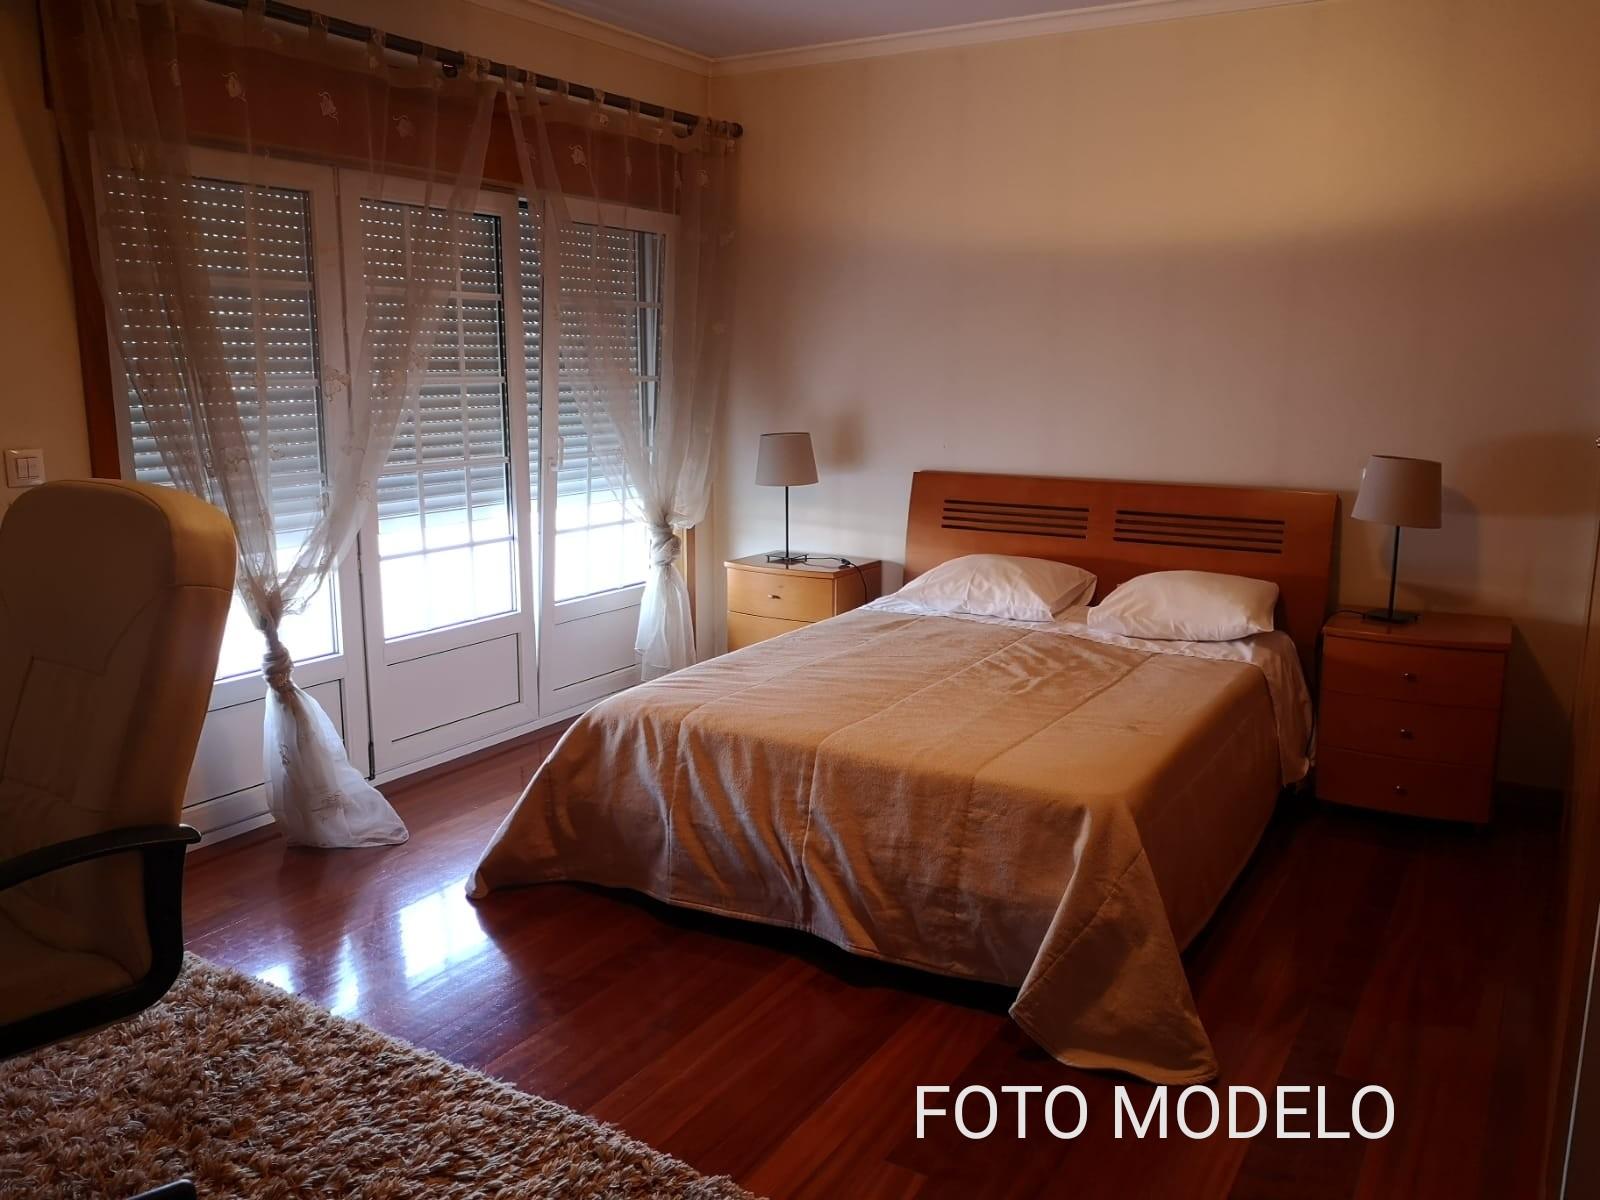 rooms-students-teachers-f5f139106027f2d38602ea573dbdece1